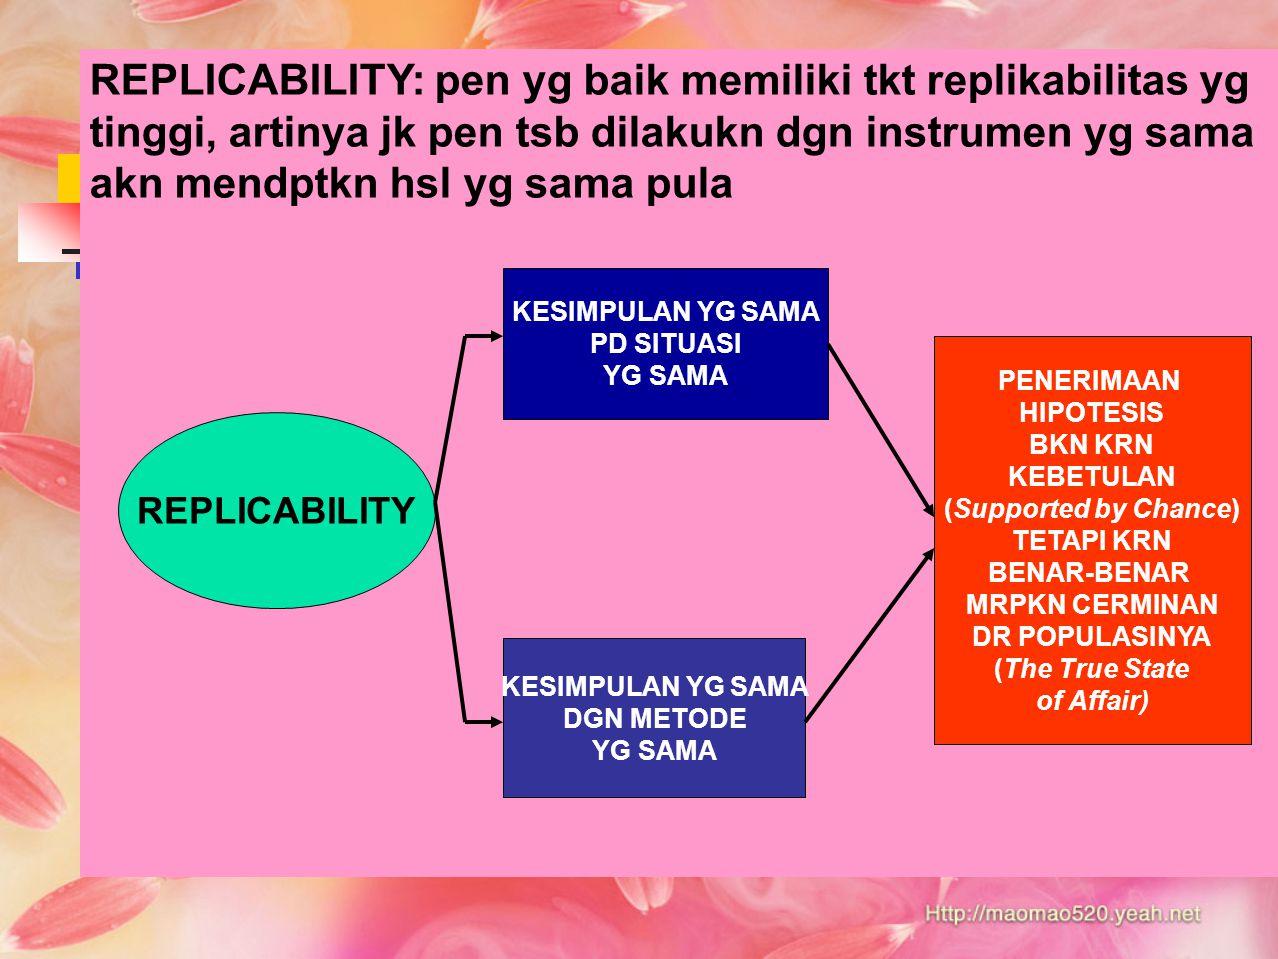 REPLICABILITY: pen yg baik memiliki tkt replikabilitas yg tinggi, artinya jk pen tsb dilakukn dgn instrumen yg sama akn mendptkn hsl yg sama pula